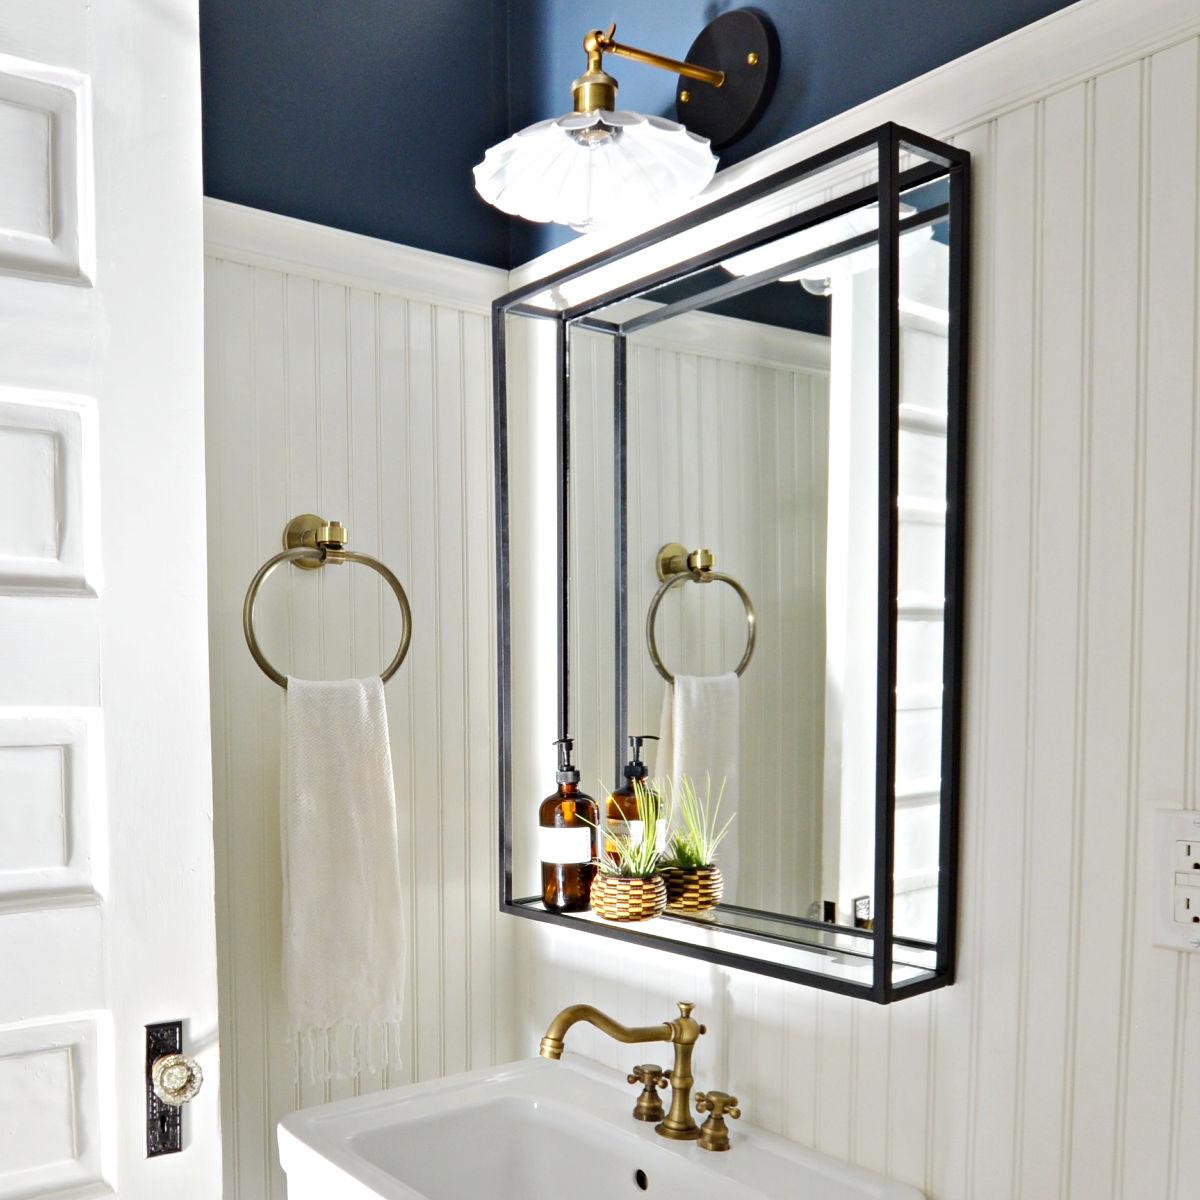 Modern Industrial Black Steel Metal Framed Bathroom Mirror With A